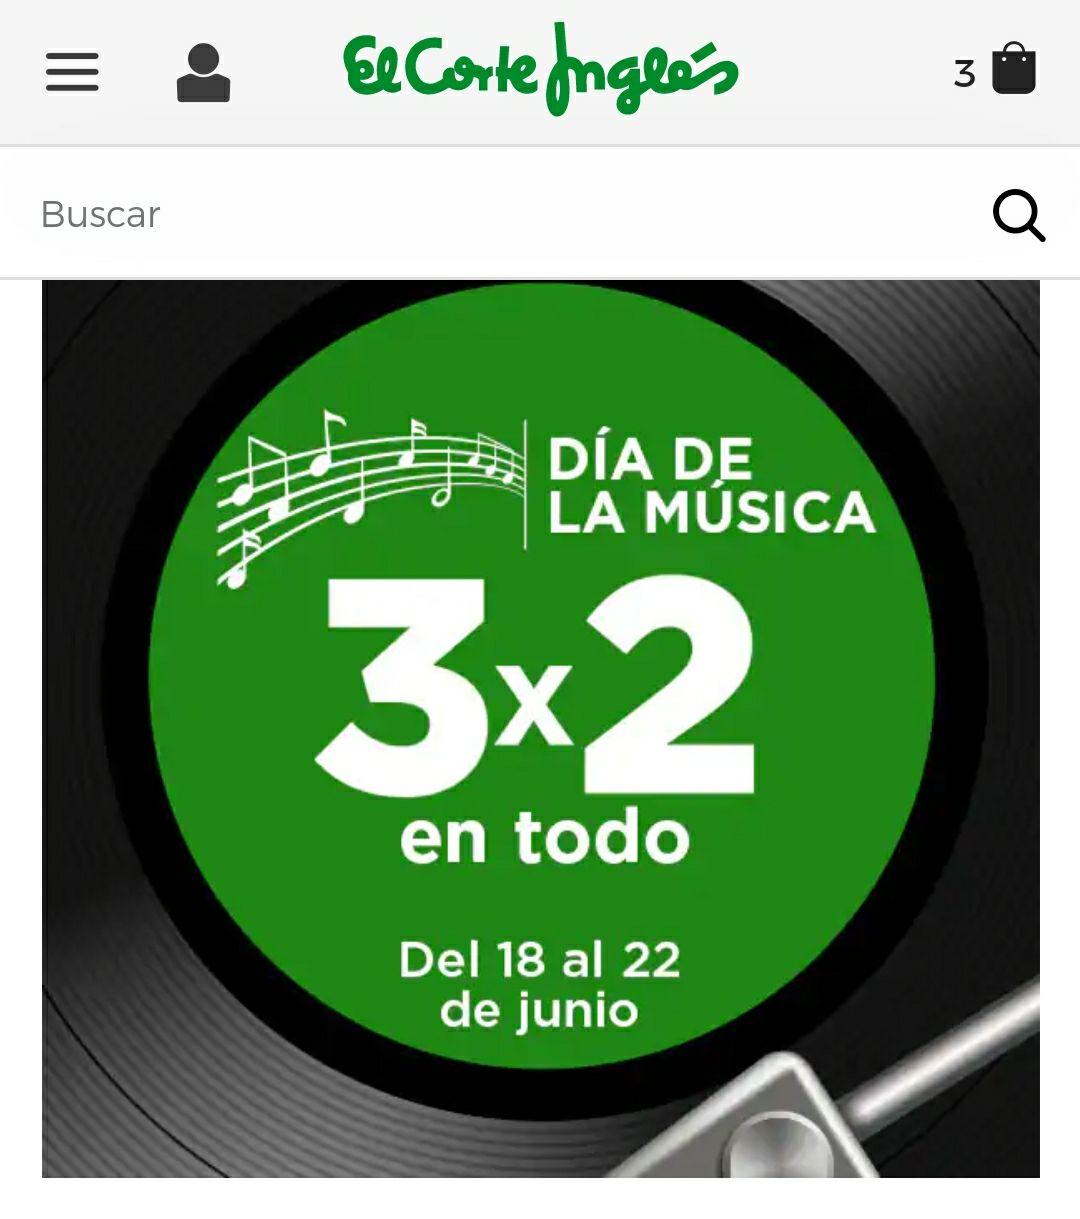 3x2 VINILOS, CD, MUSICA